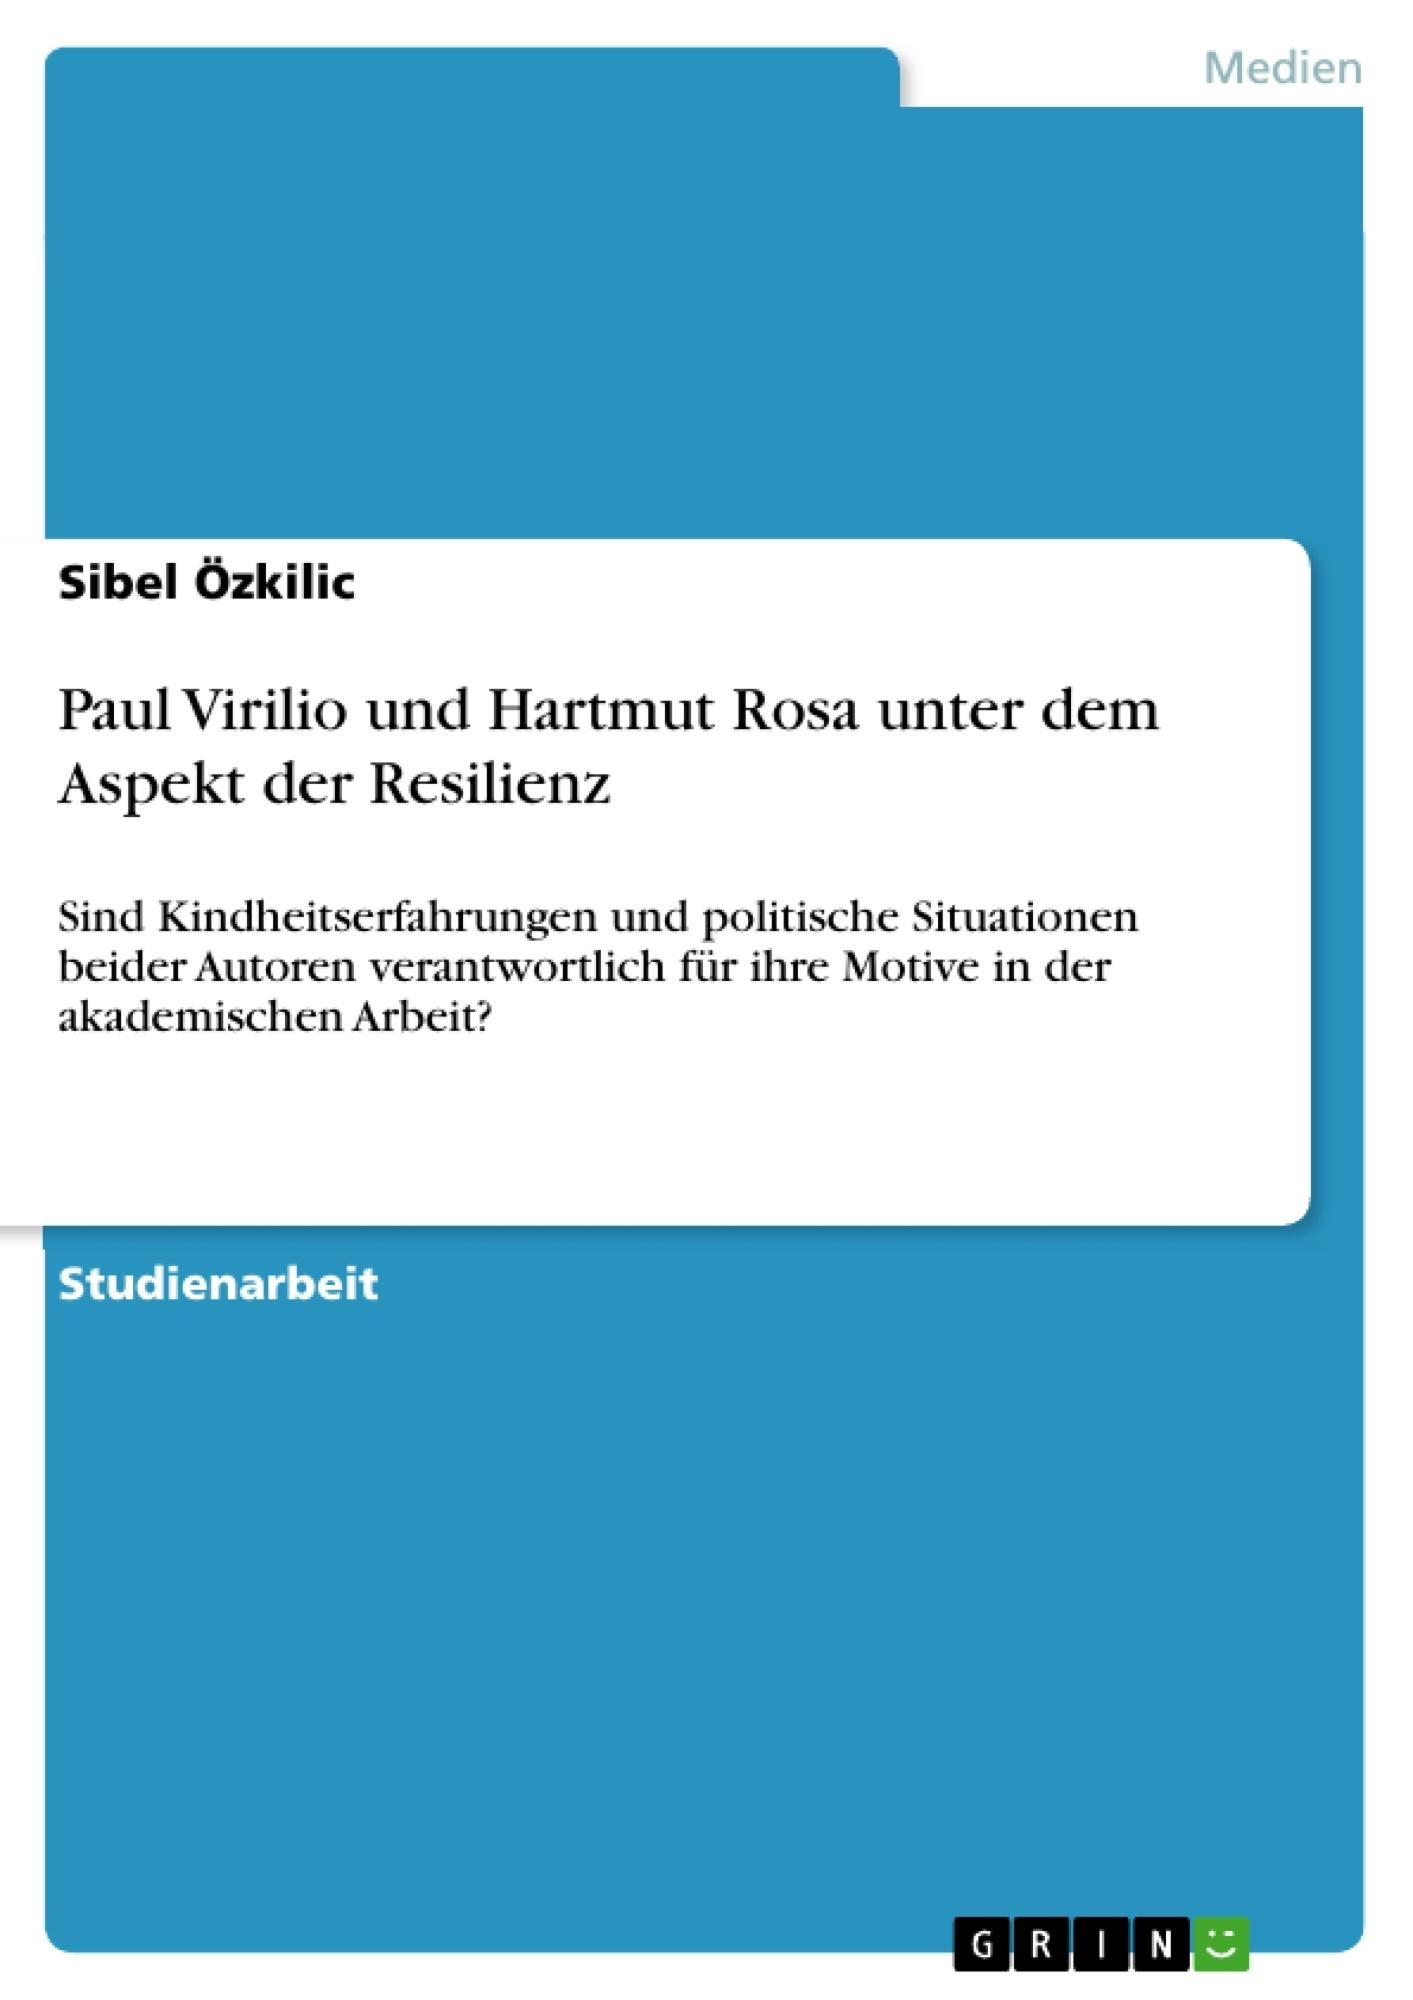 Titel: Paul Virilio und Hartmut Rosa unter dem Aspekt der Resilienz